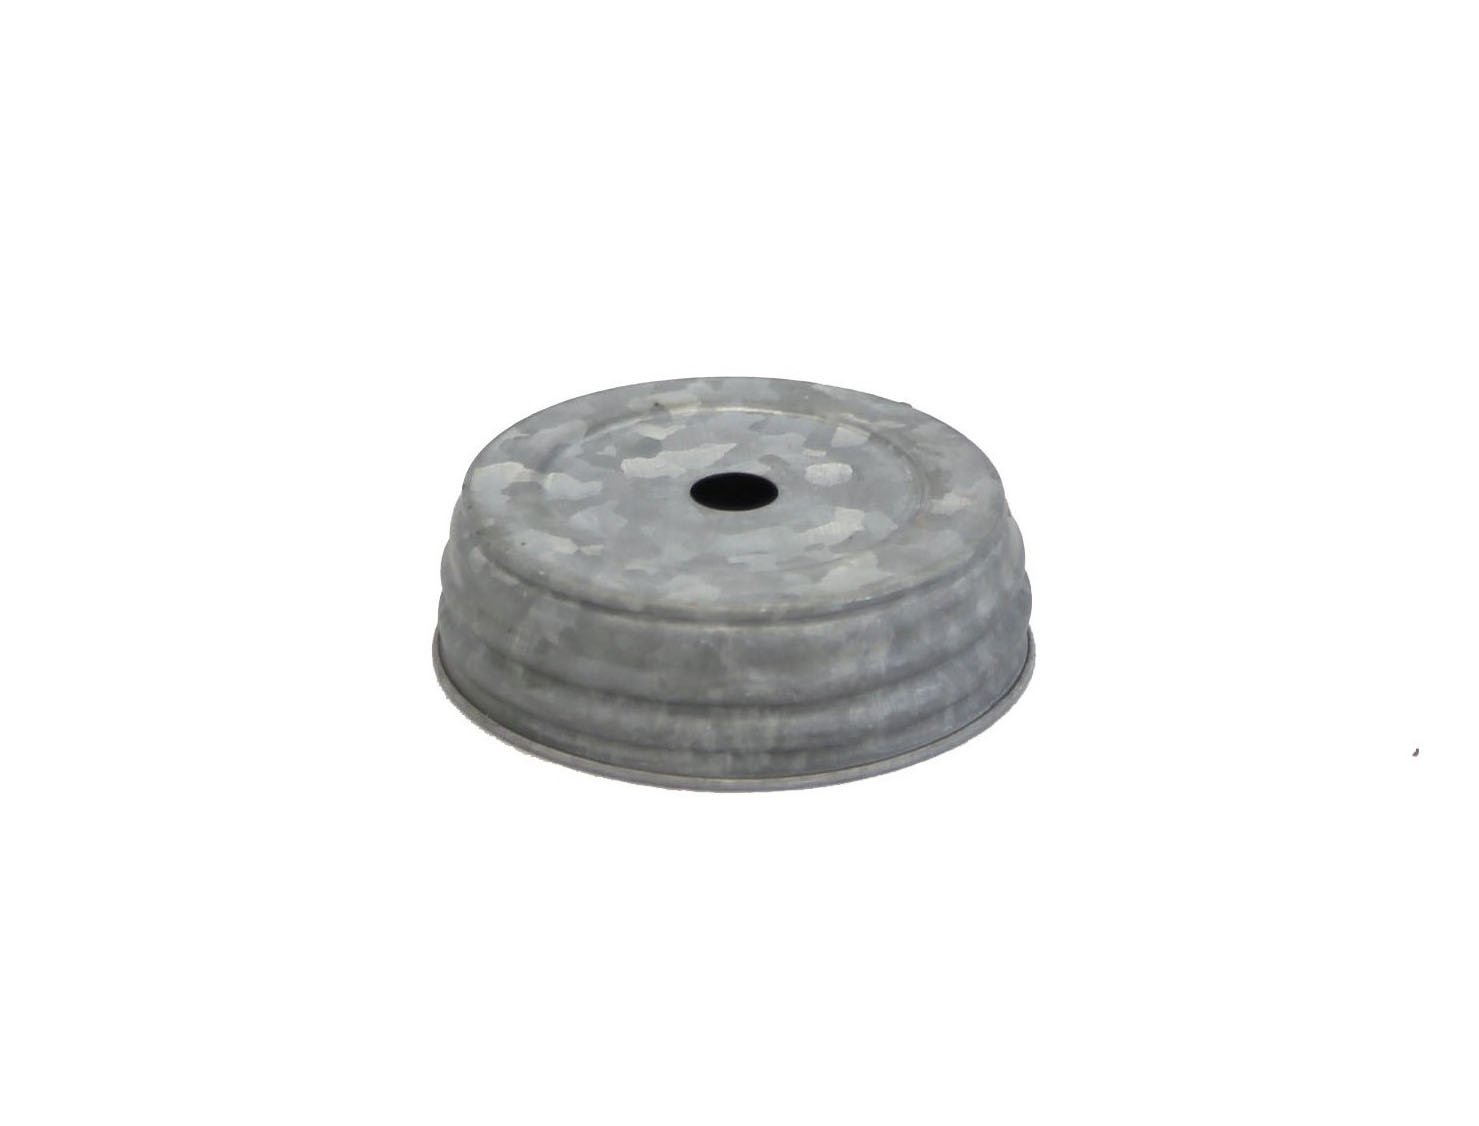 Gray Zinc Mason Jar Lid With Hole - Set Of 6